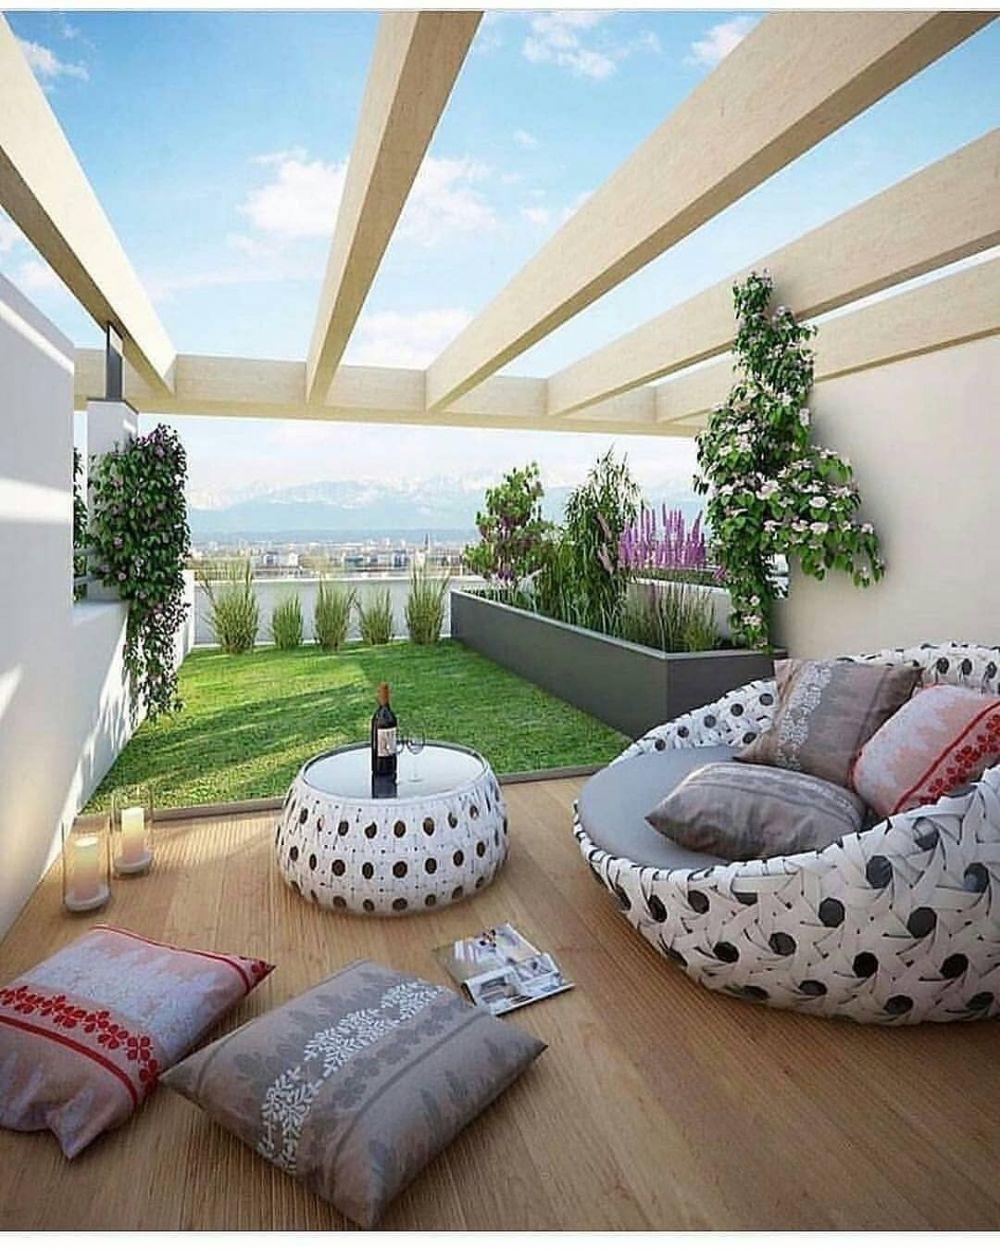 Manfaatkan Rooftop Rumah Sebagai Tempat Bersantai Yang Asik. Yuk Intip  Desainnya! - Developer Property Syariah, Jual Perumahan Syariah Semarang,  Pekalongan, Karawang, Salatiga | Firmana Property